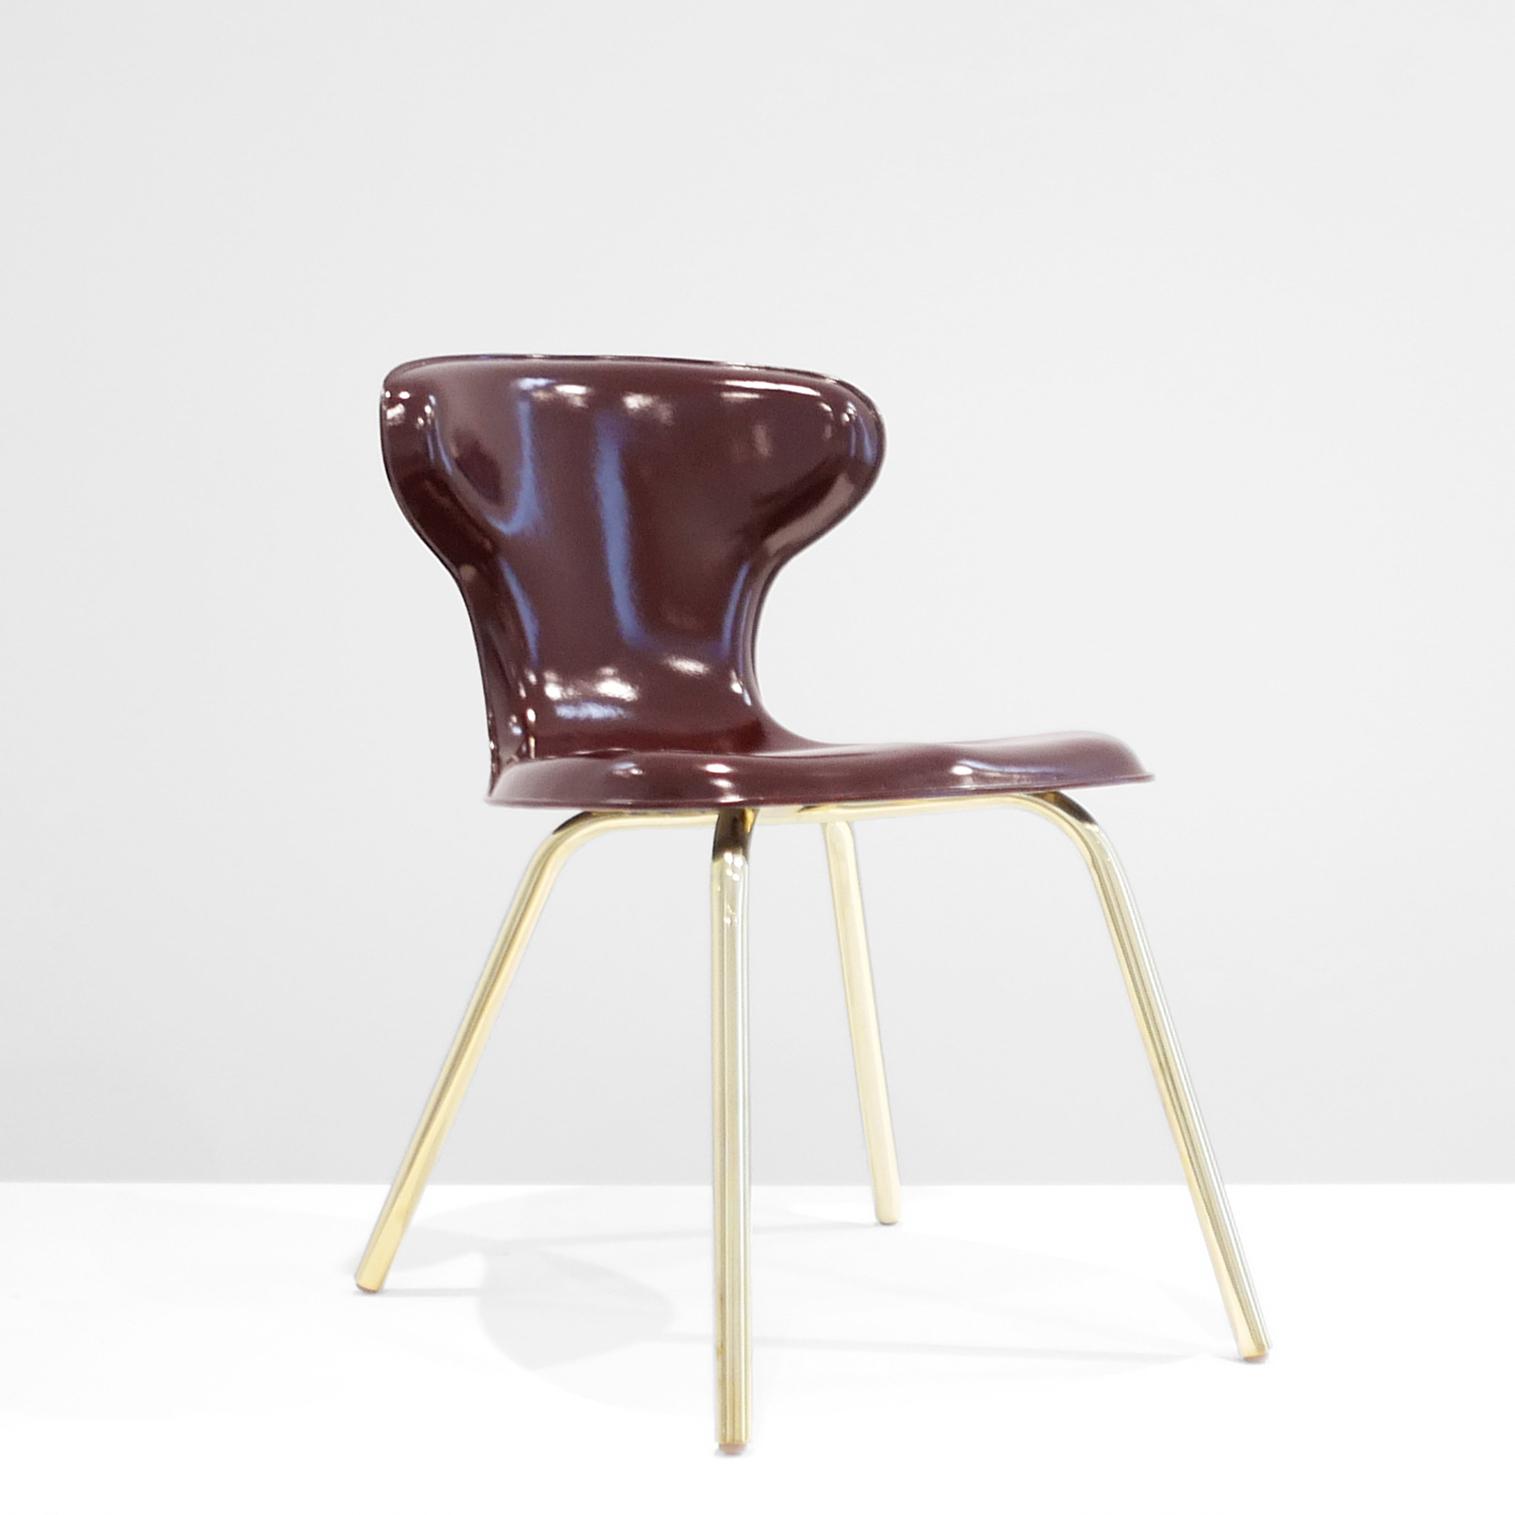 egmont arens  fiberglass chair  c. 1950 - 1959 ...